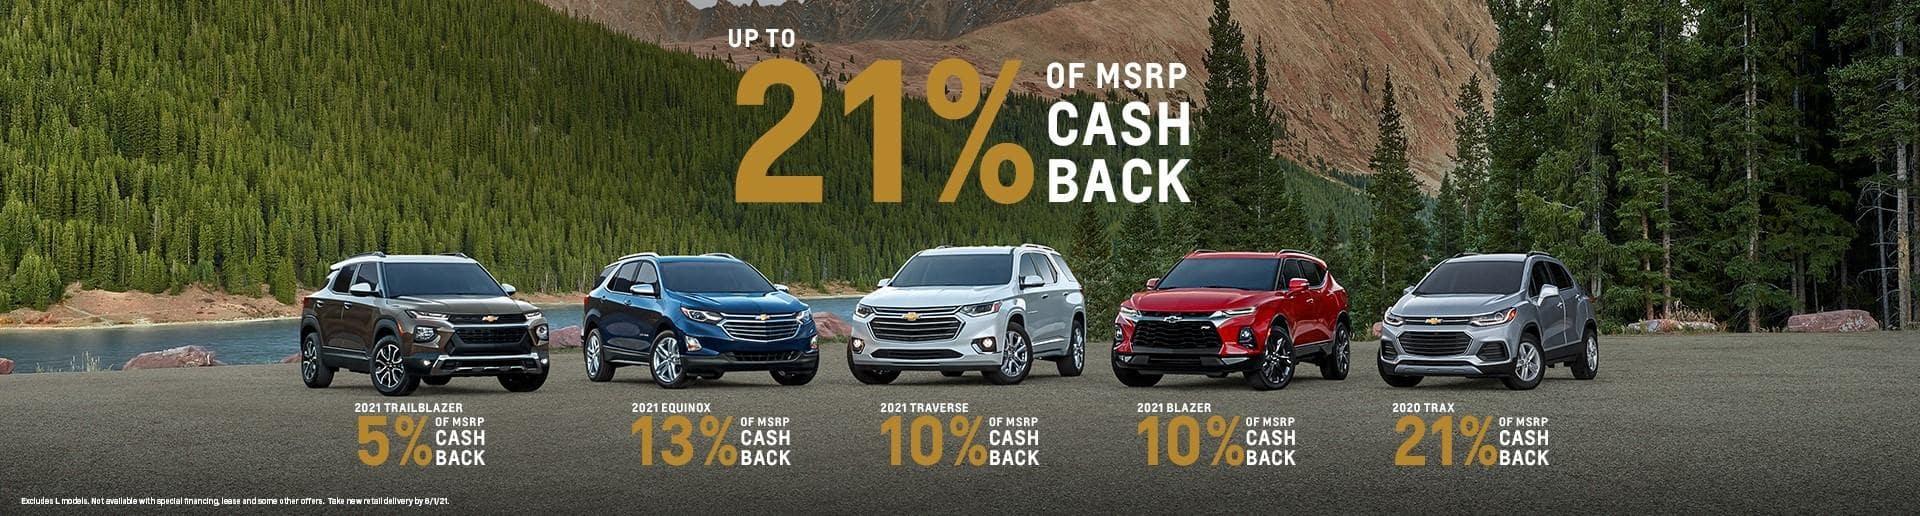 Chevy_Chicago_cash_back_slide